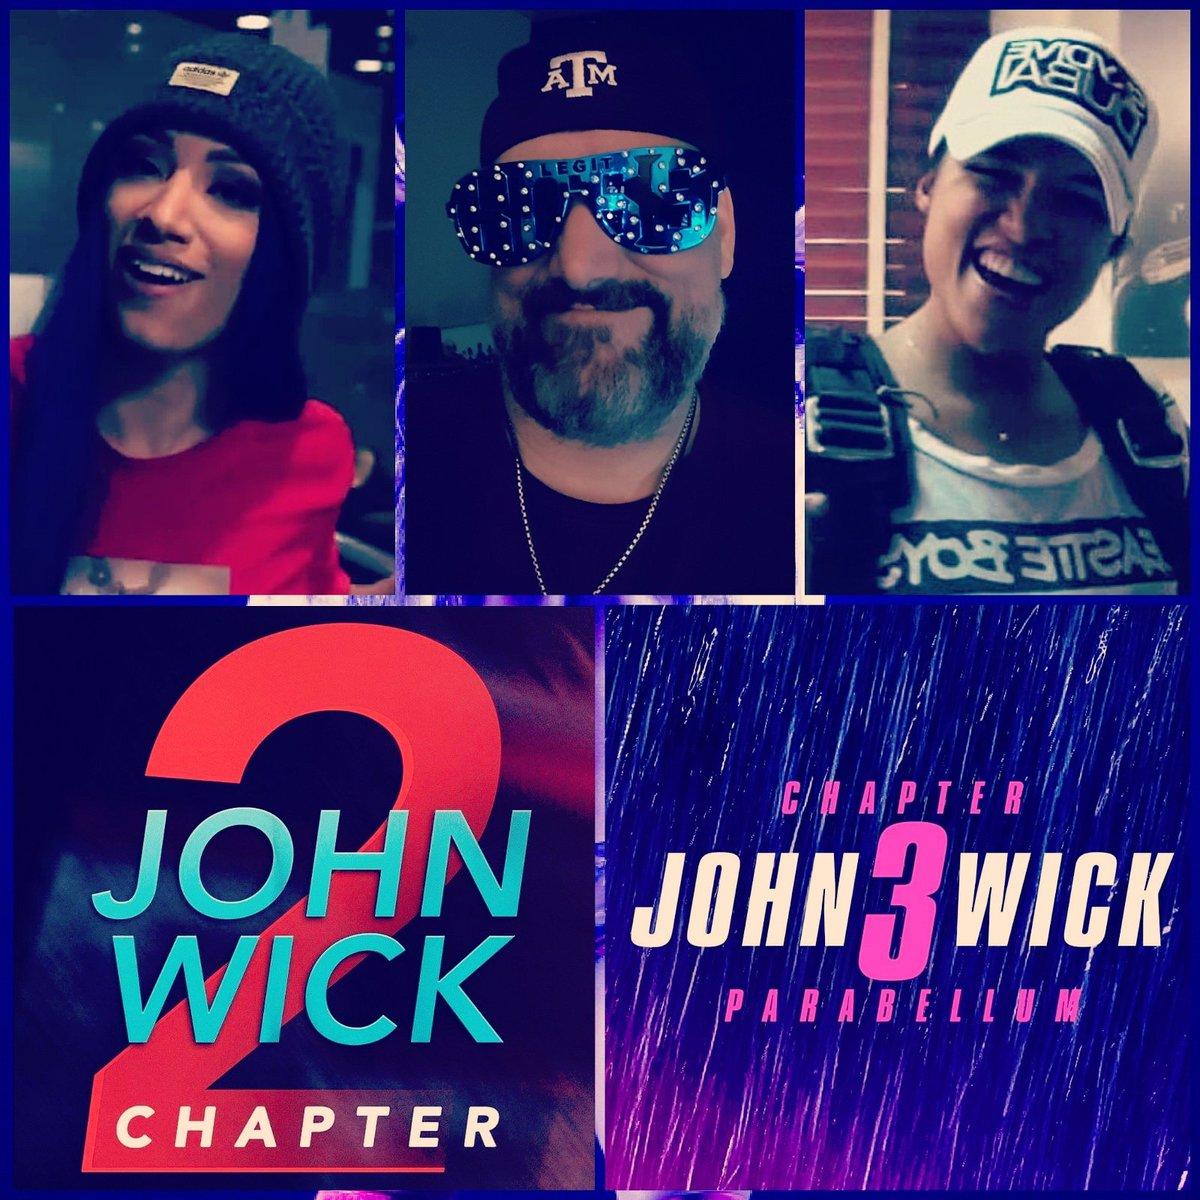 2nite #Movies Watching #JohnWick2 & #JohnWick3 y'all #Happy #Selfie #ActionCrimeThriller #mrodfamily #mrodlover #SashaKrew #LegitBlueprint pic.twitter.com/ib7L52A1D9